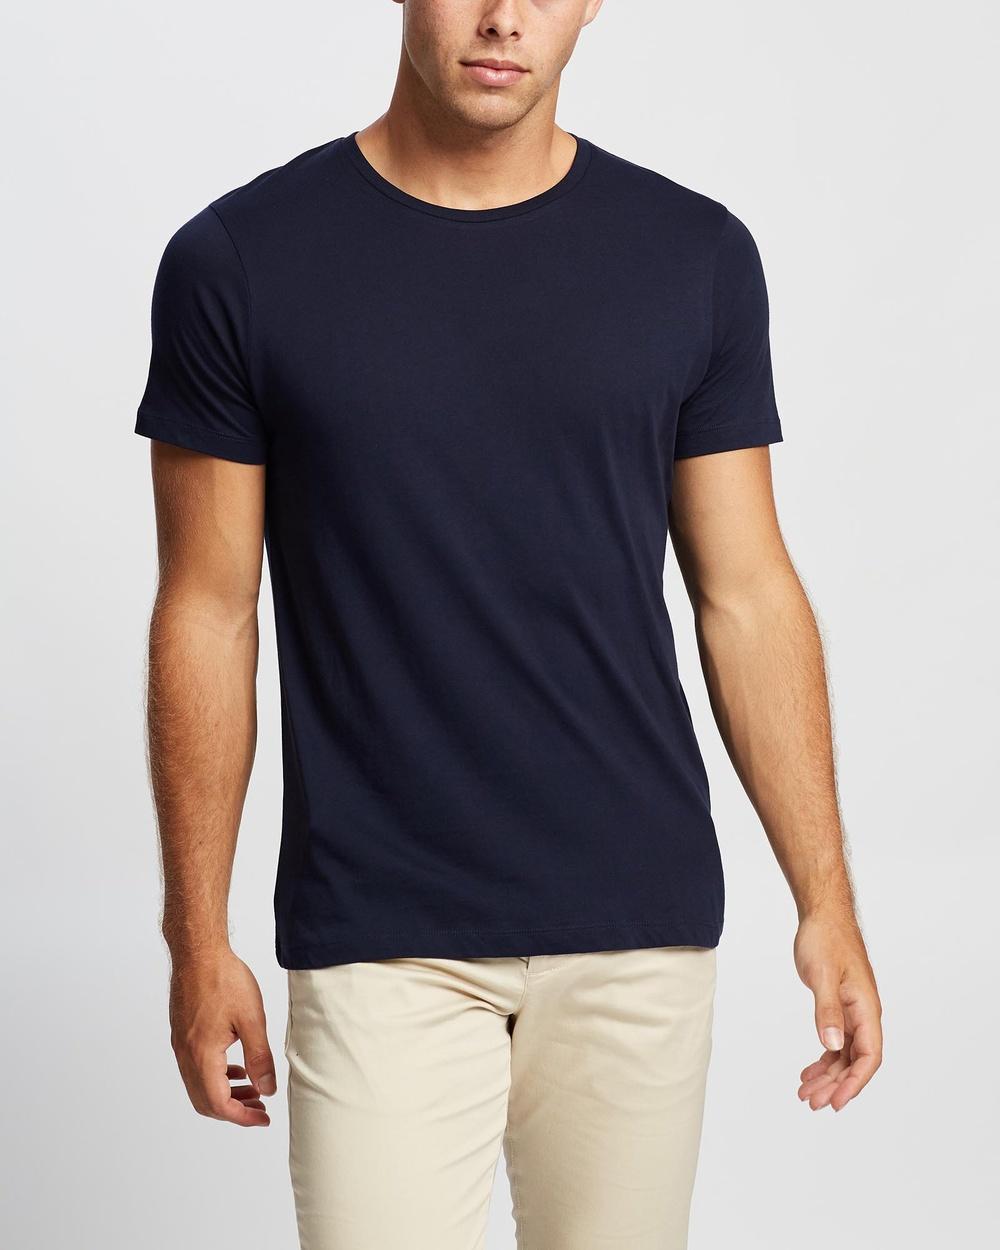 Marcs Brando Pima Tee T-Shirts & Singlets NAVY Australia